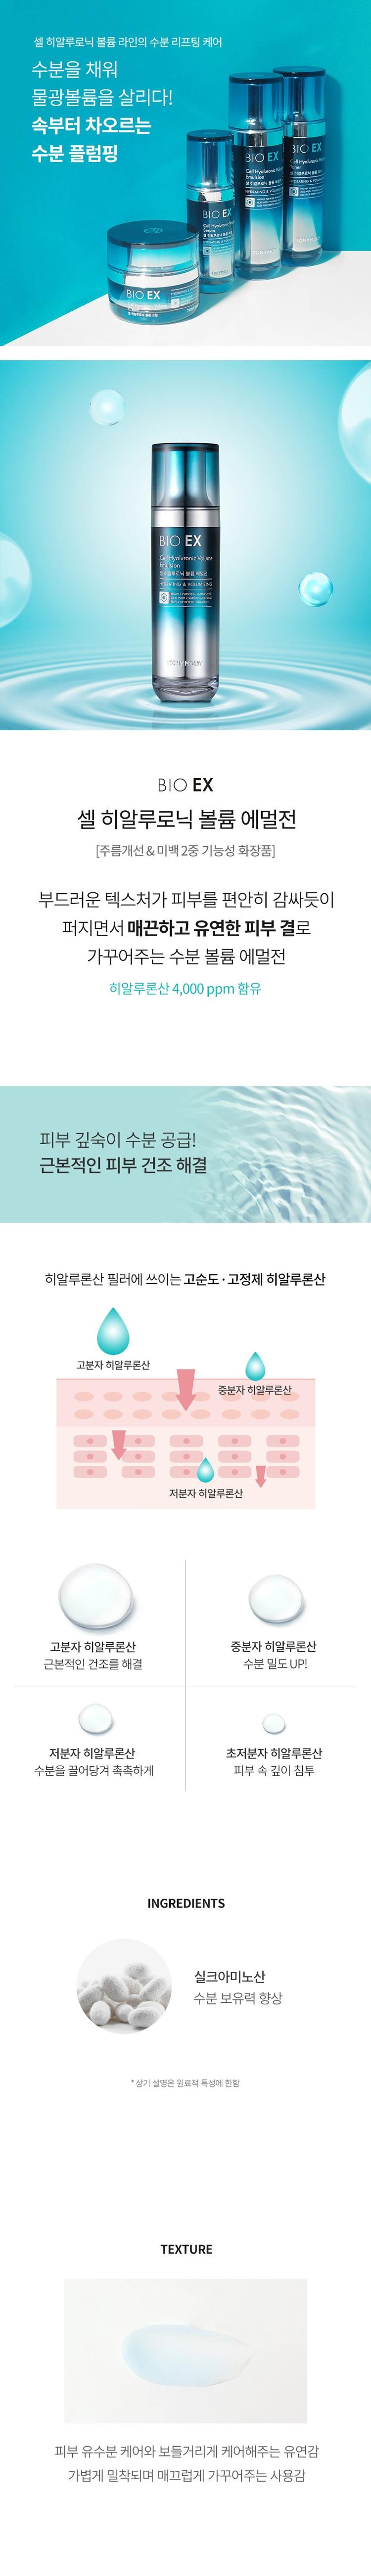 TONYMOLY Bio EX Cell Hyaluronic Volume Emulsion korean skincare product online shop malaysia China india1